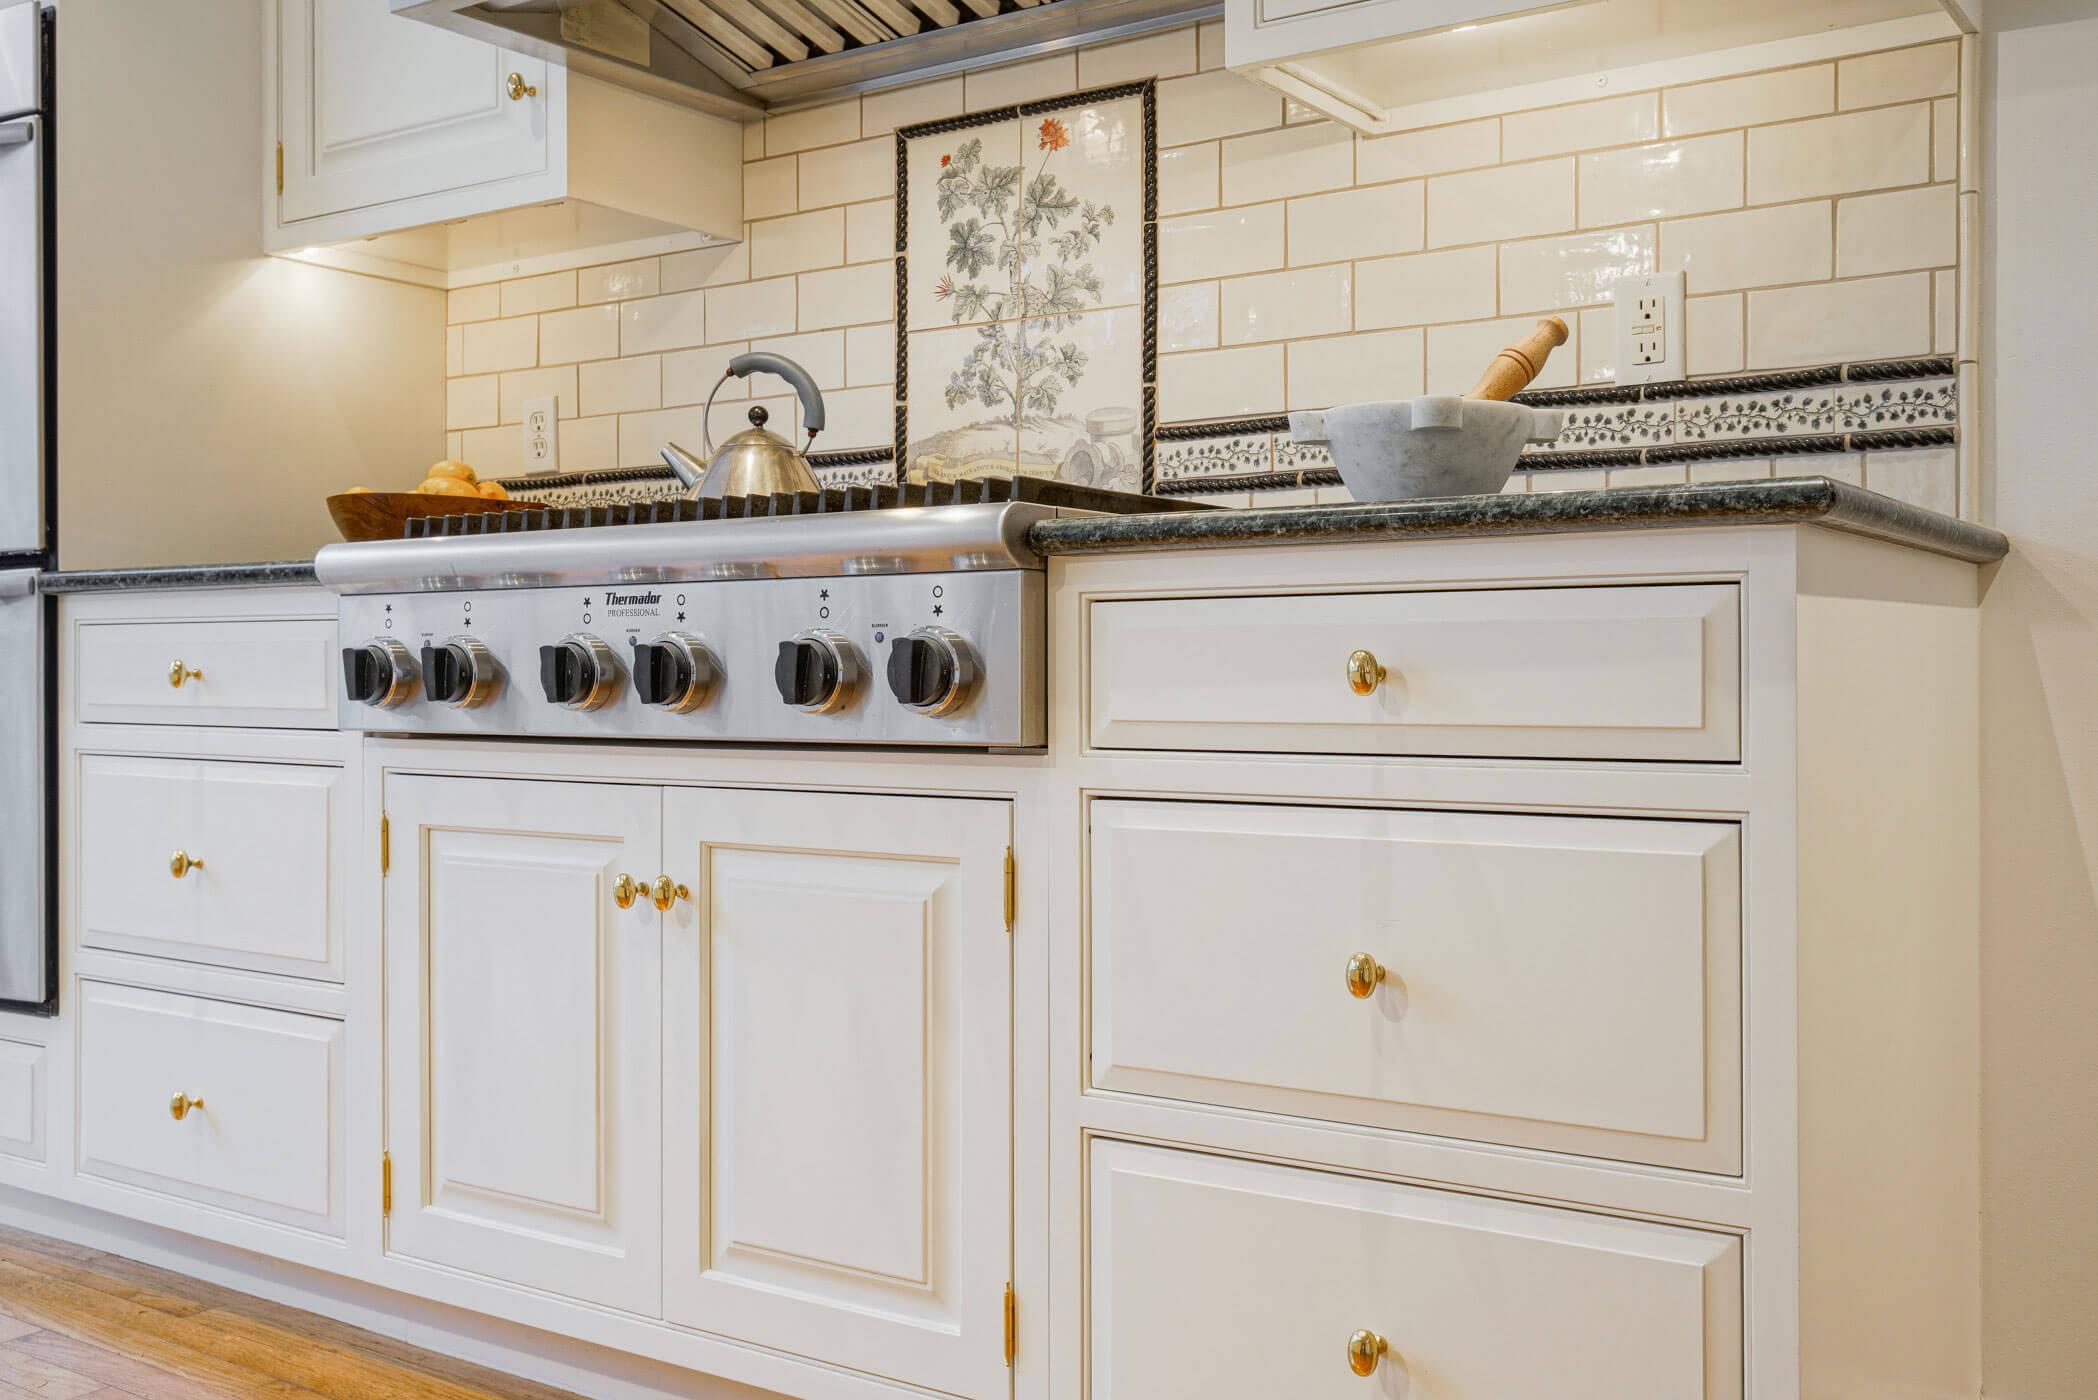 Admirable Kitchen Cabinet Painters Download Free Architecture Designs Intelgarnamadebymaigaardcom